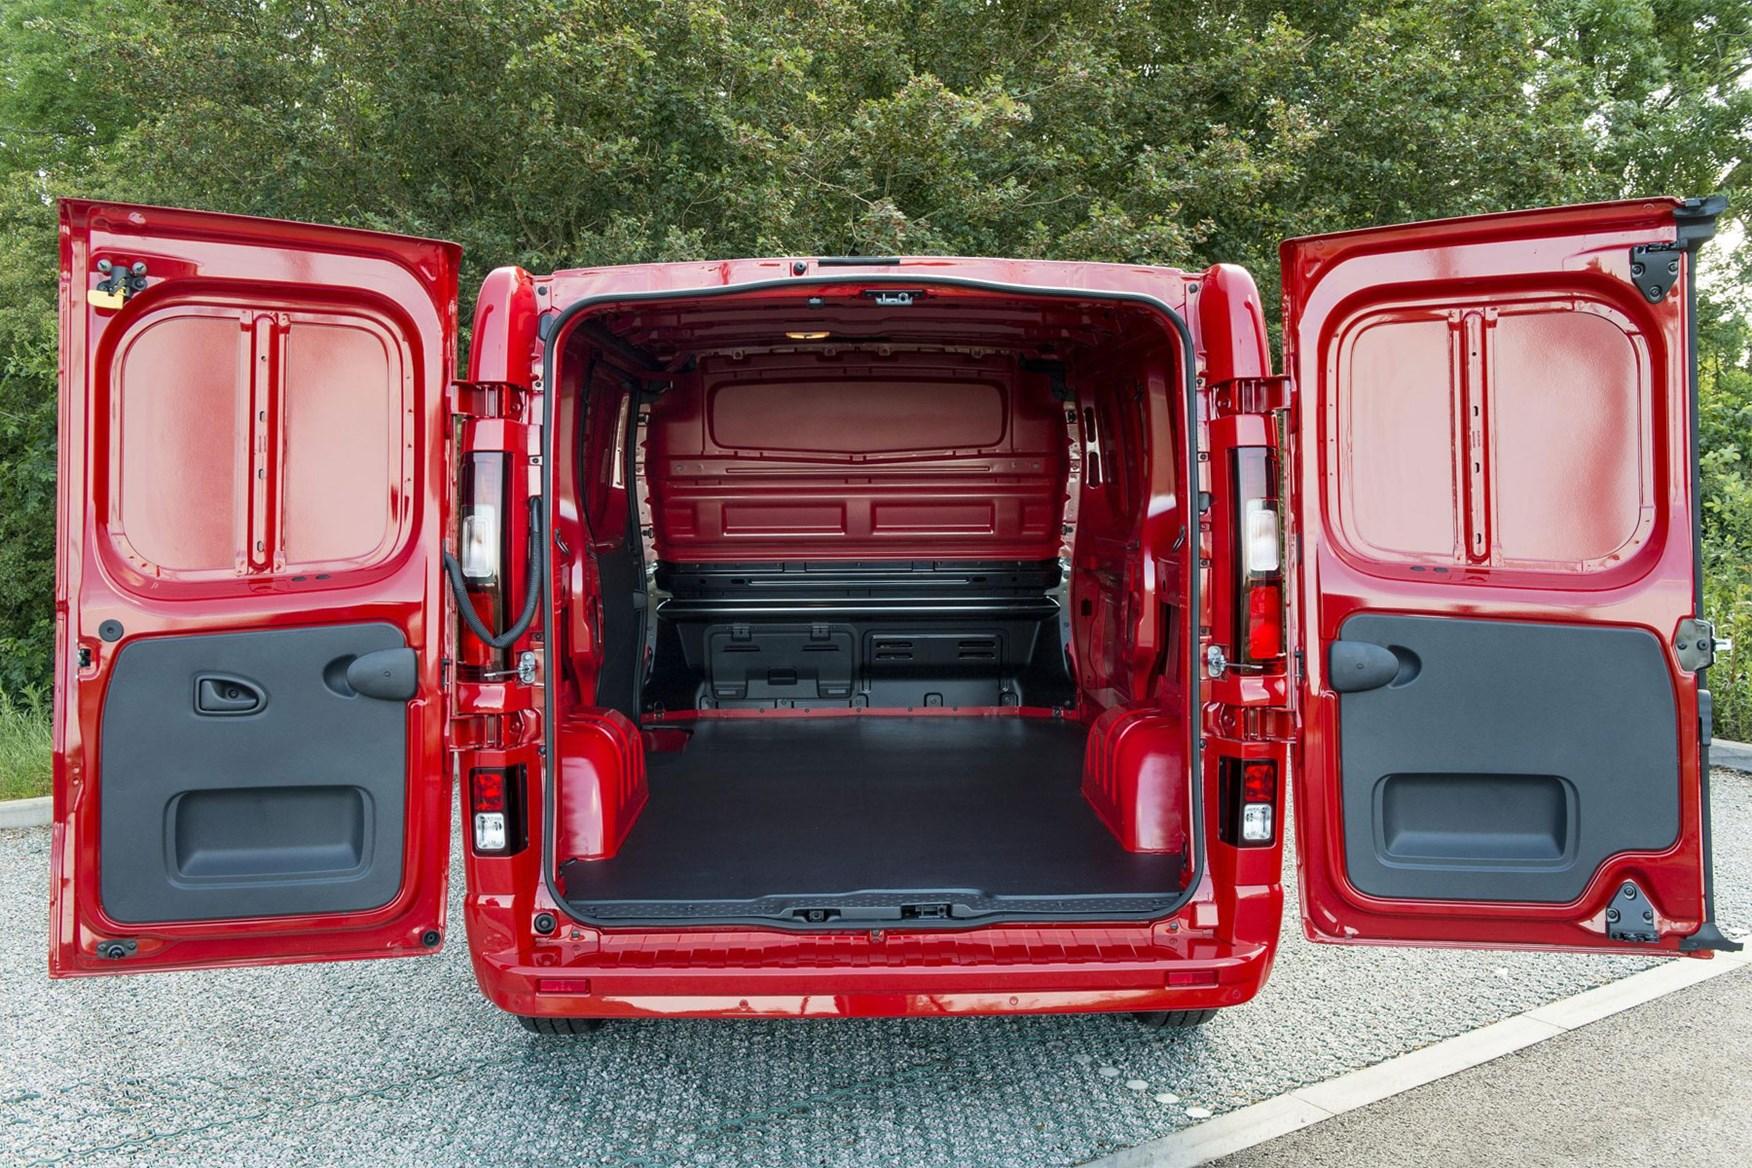 Vauxhall Vivaro dimension - load area with doors open